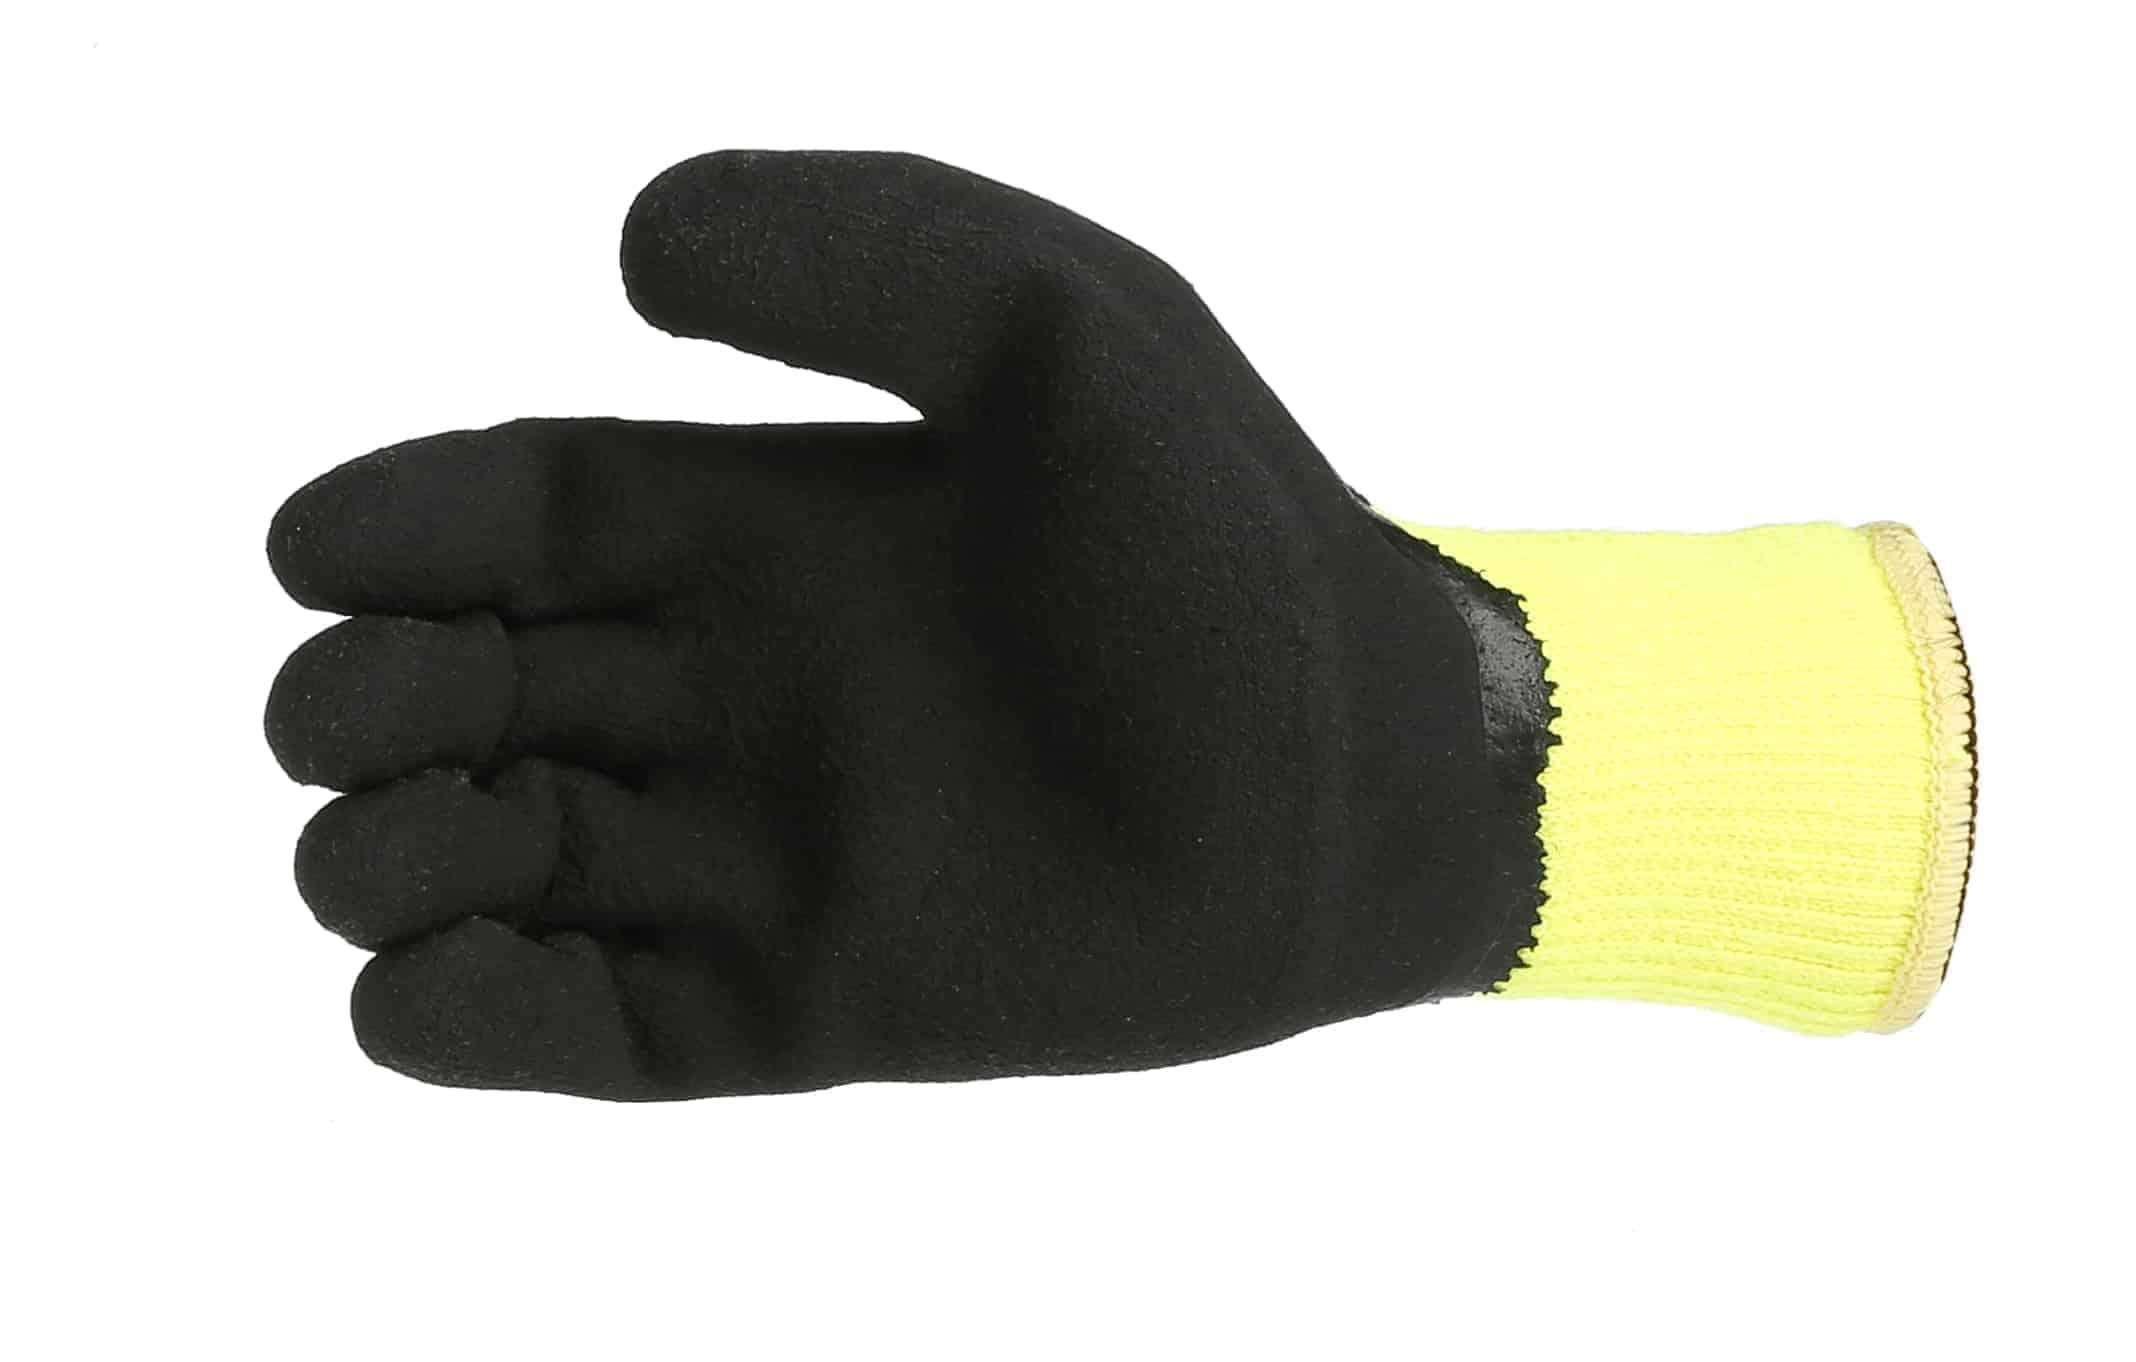 Construhot Safety Gloves by Safety Jogger